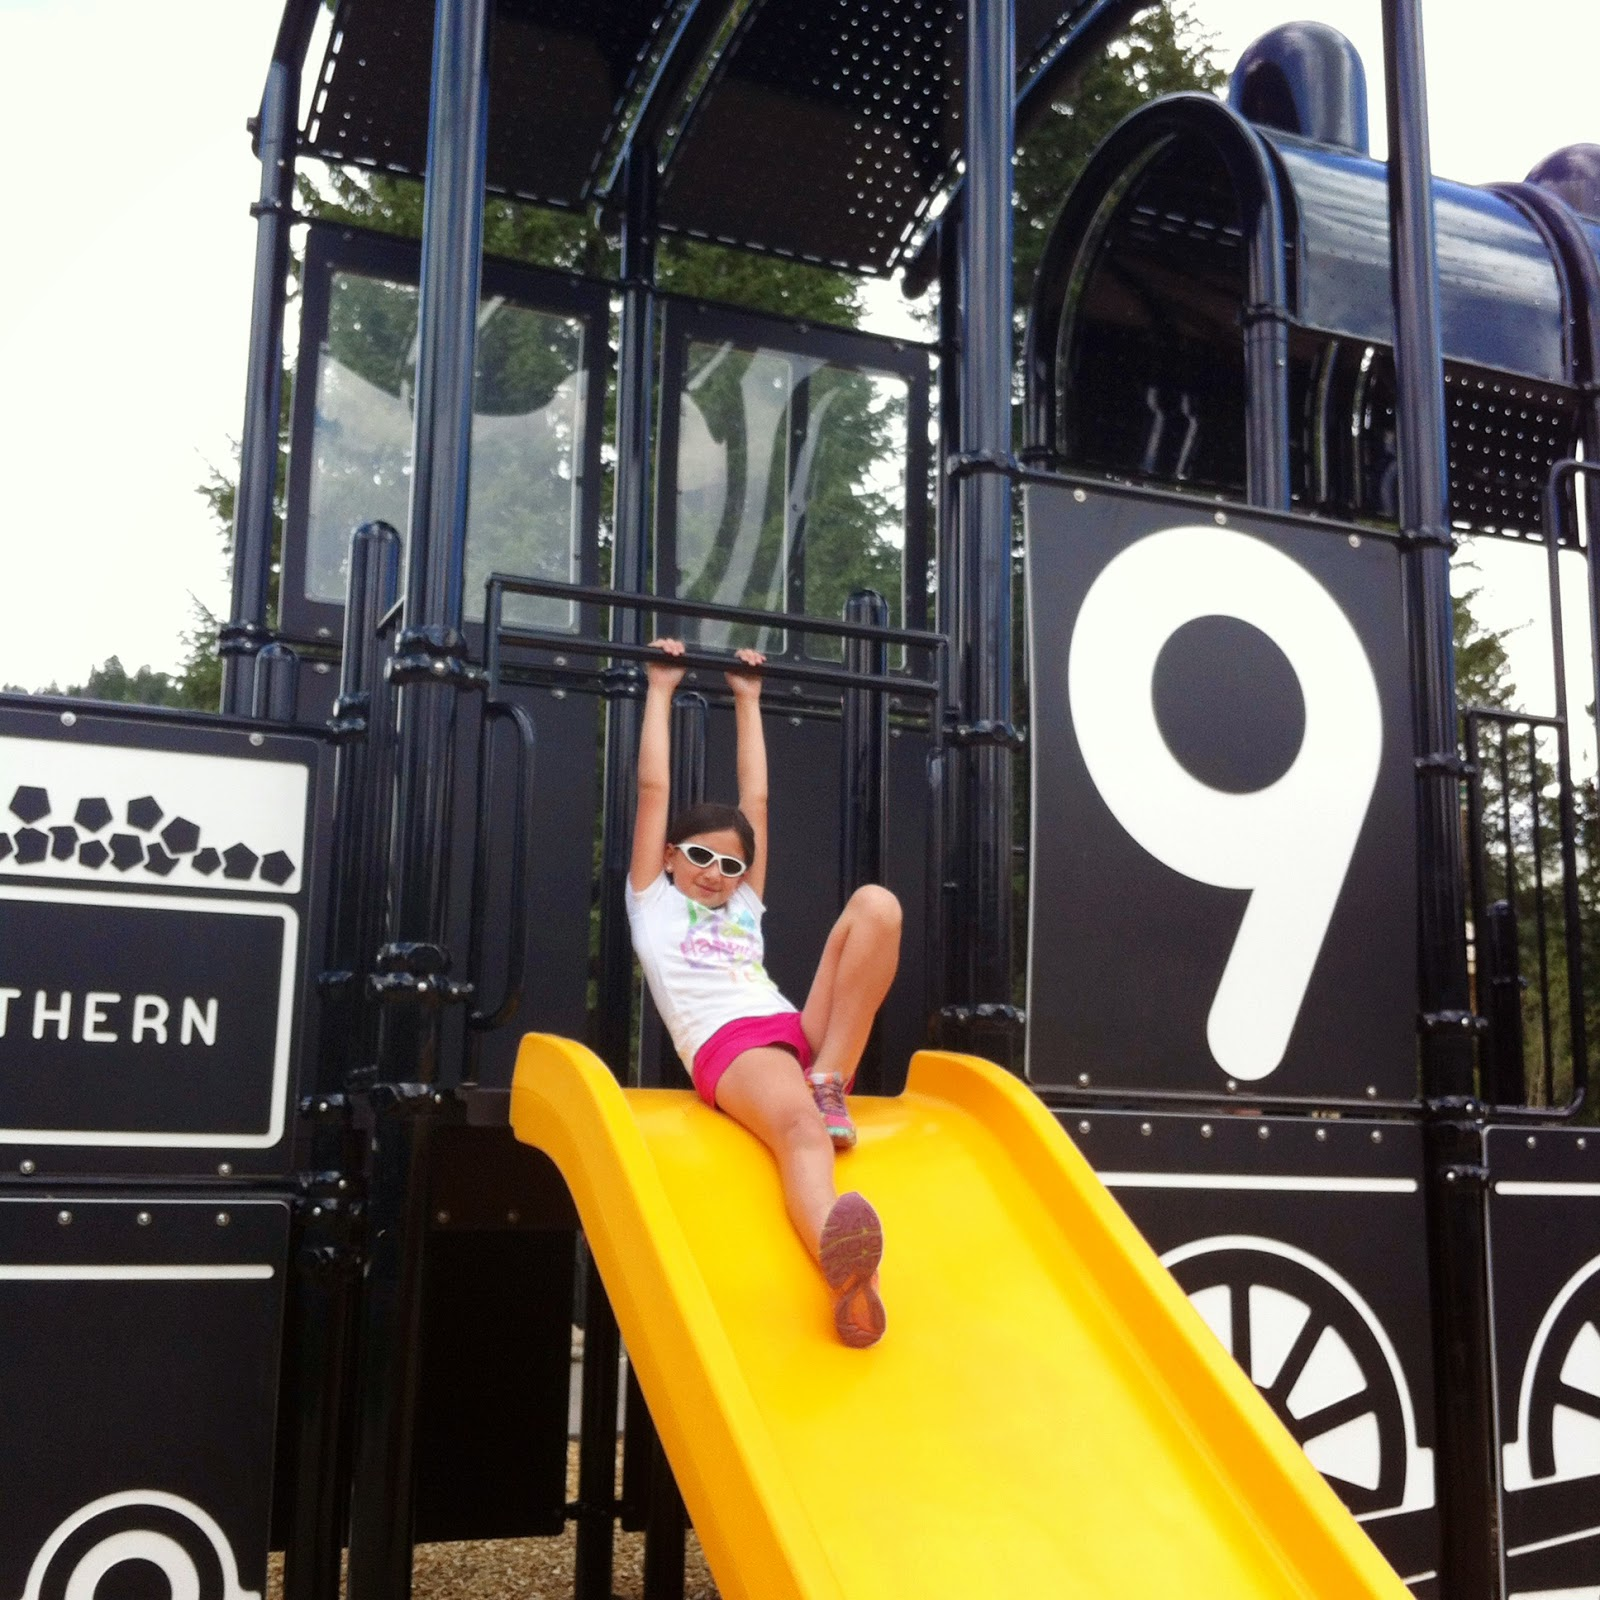 Train playground in Breckenridge